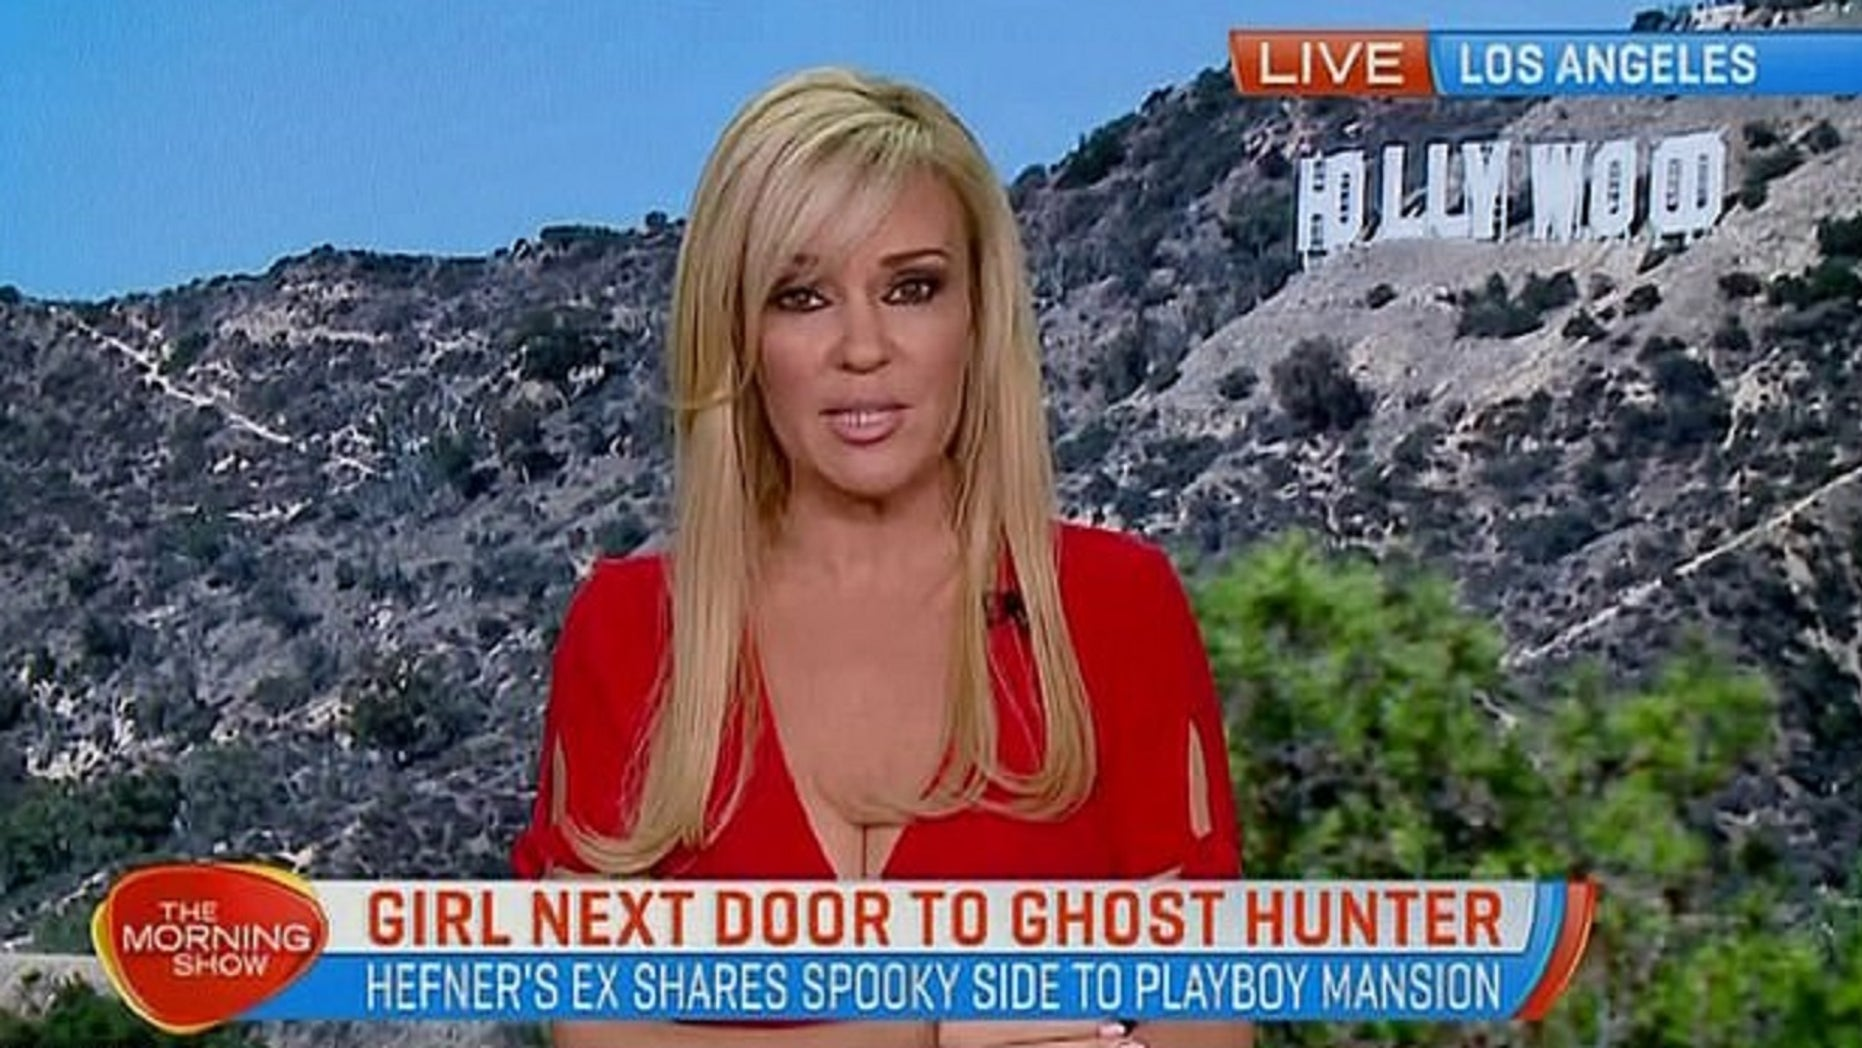 Playboy publisher Hugh Hefner's ex-girlfriend Bridget Marquardt said in an interview Monday that she saw a female spirit in the Playboy Mansion.